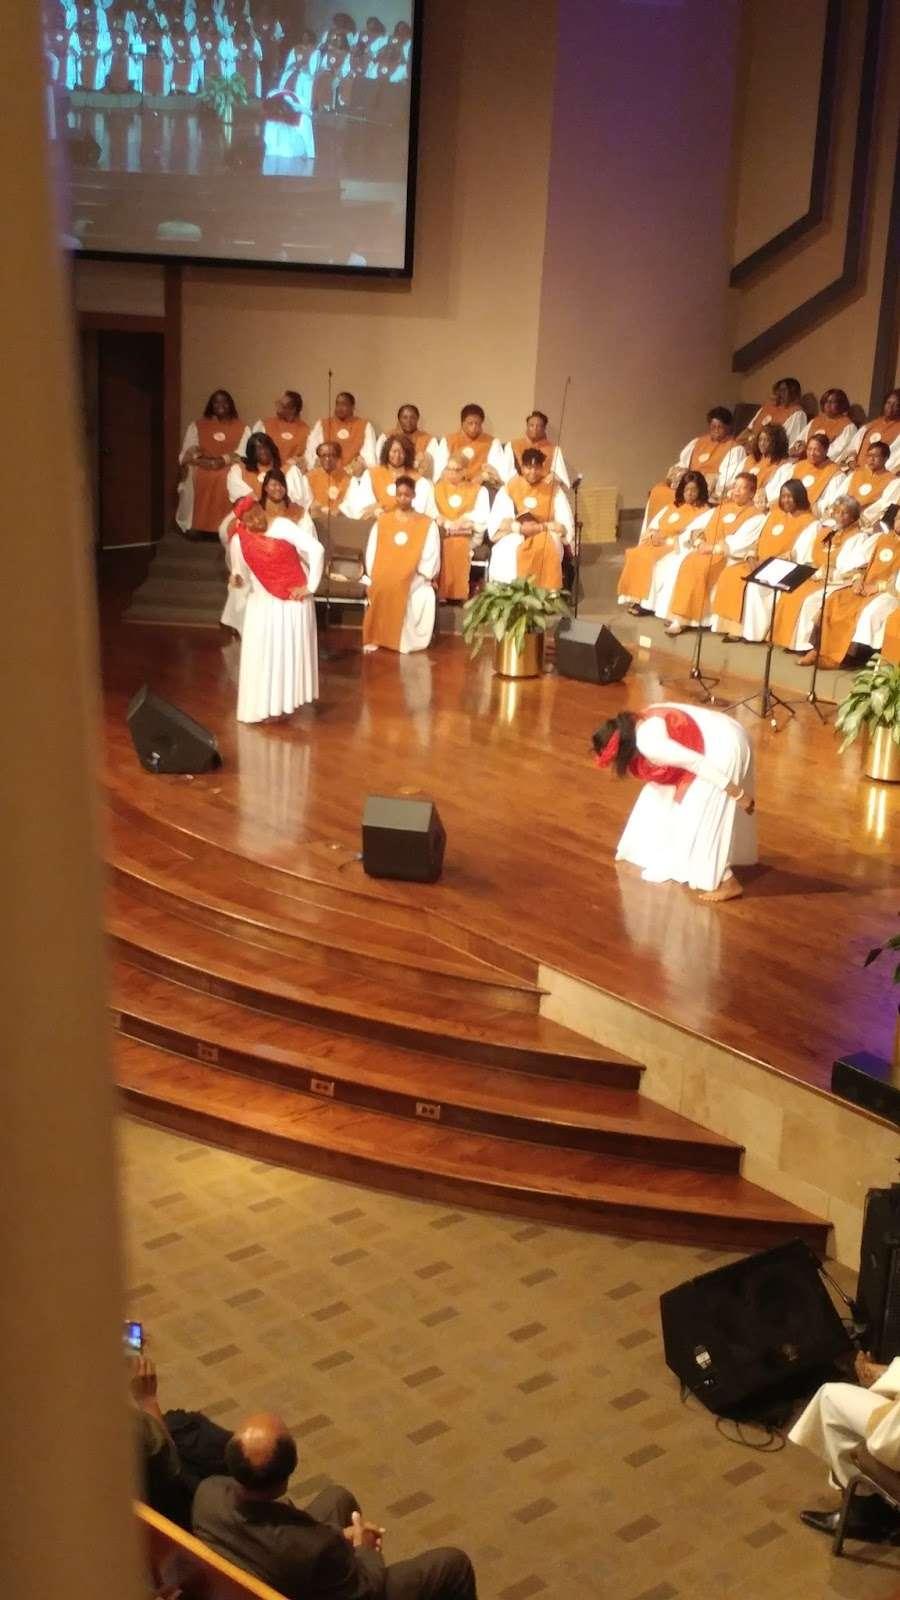 The Church Without Walls - Eldridge - church  | Photo 4 of 10 | Address: 7500 Eldridge Pkwy, Houston, TX 77083, USA | Phone: (281) 649-6800